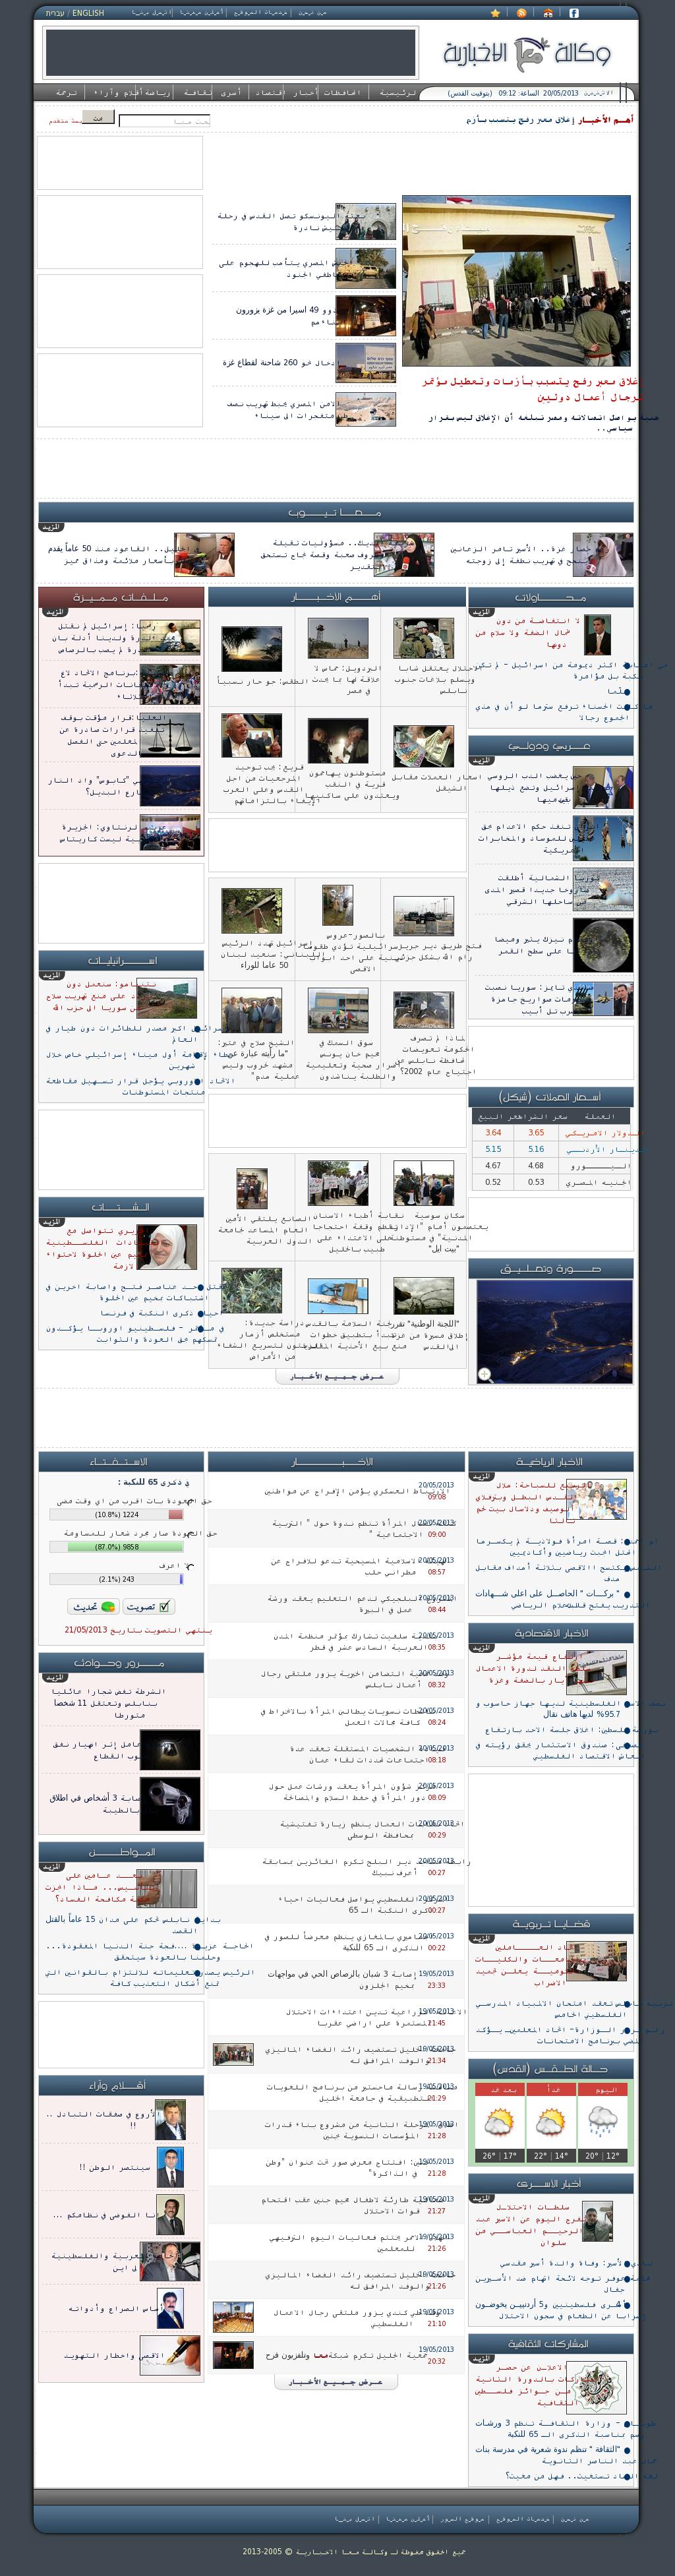 Ma'an News at Monday May 20, 2013, 6:12 a.m. UTC